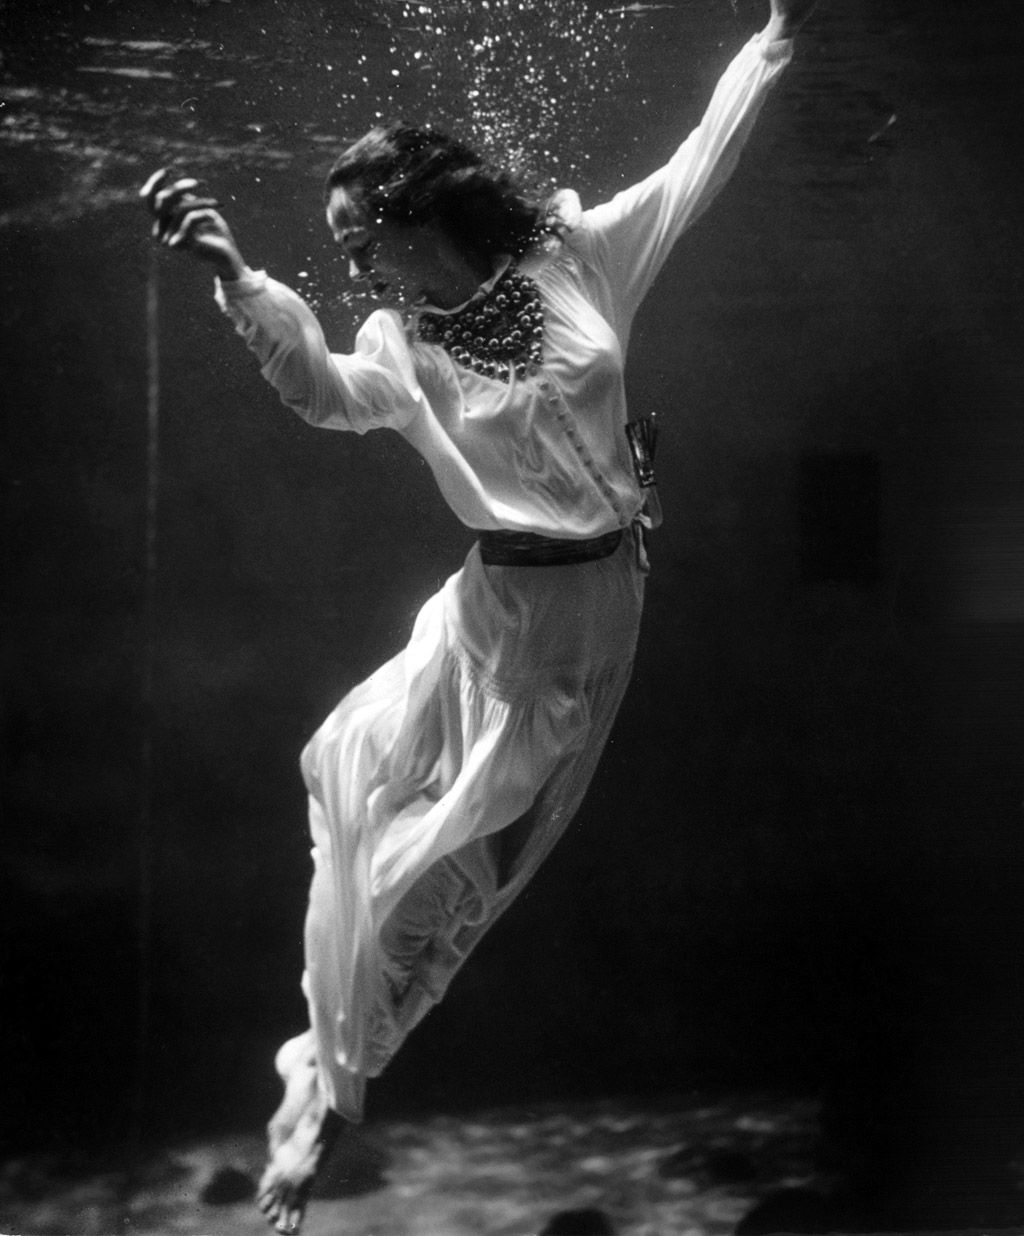 Toni Frissell Fashion Photography (avec images) | Photographie ...